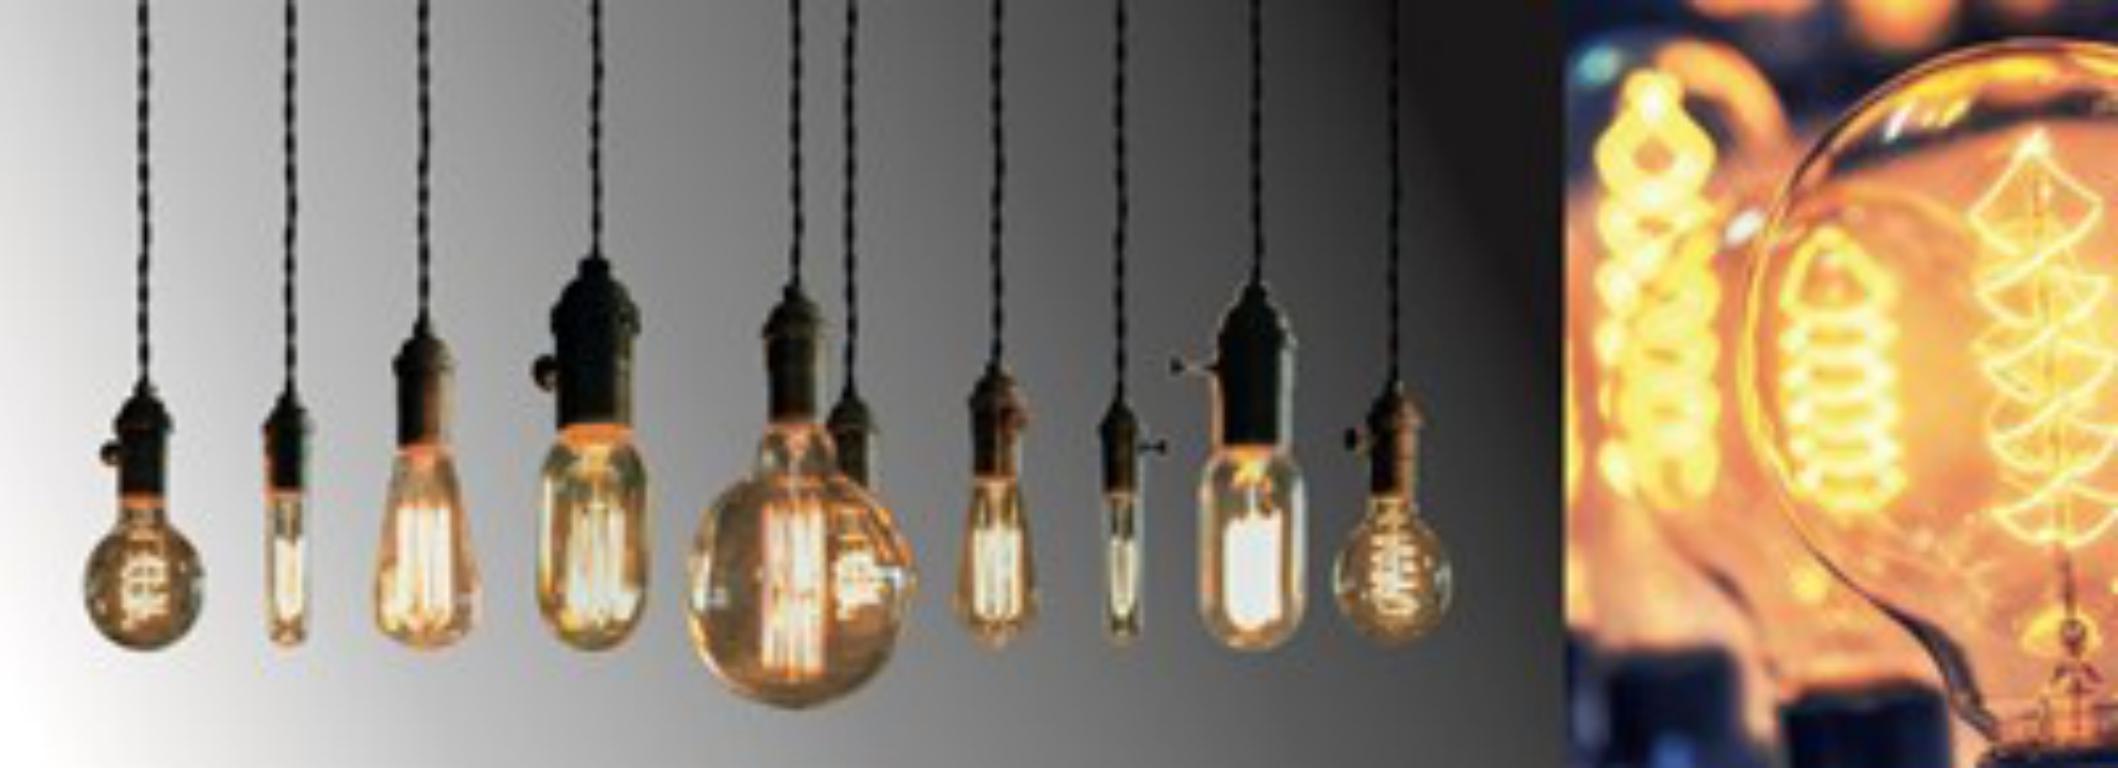 lampen verlichting sensa interieur meubelen